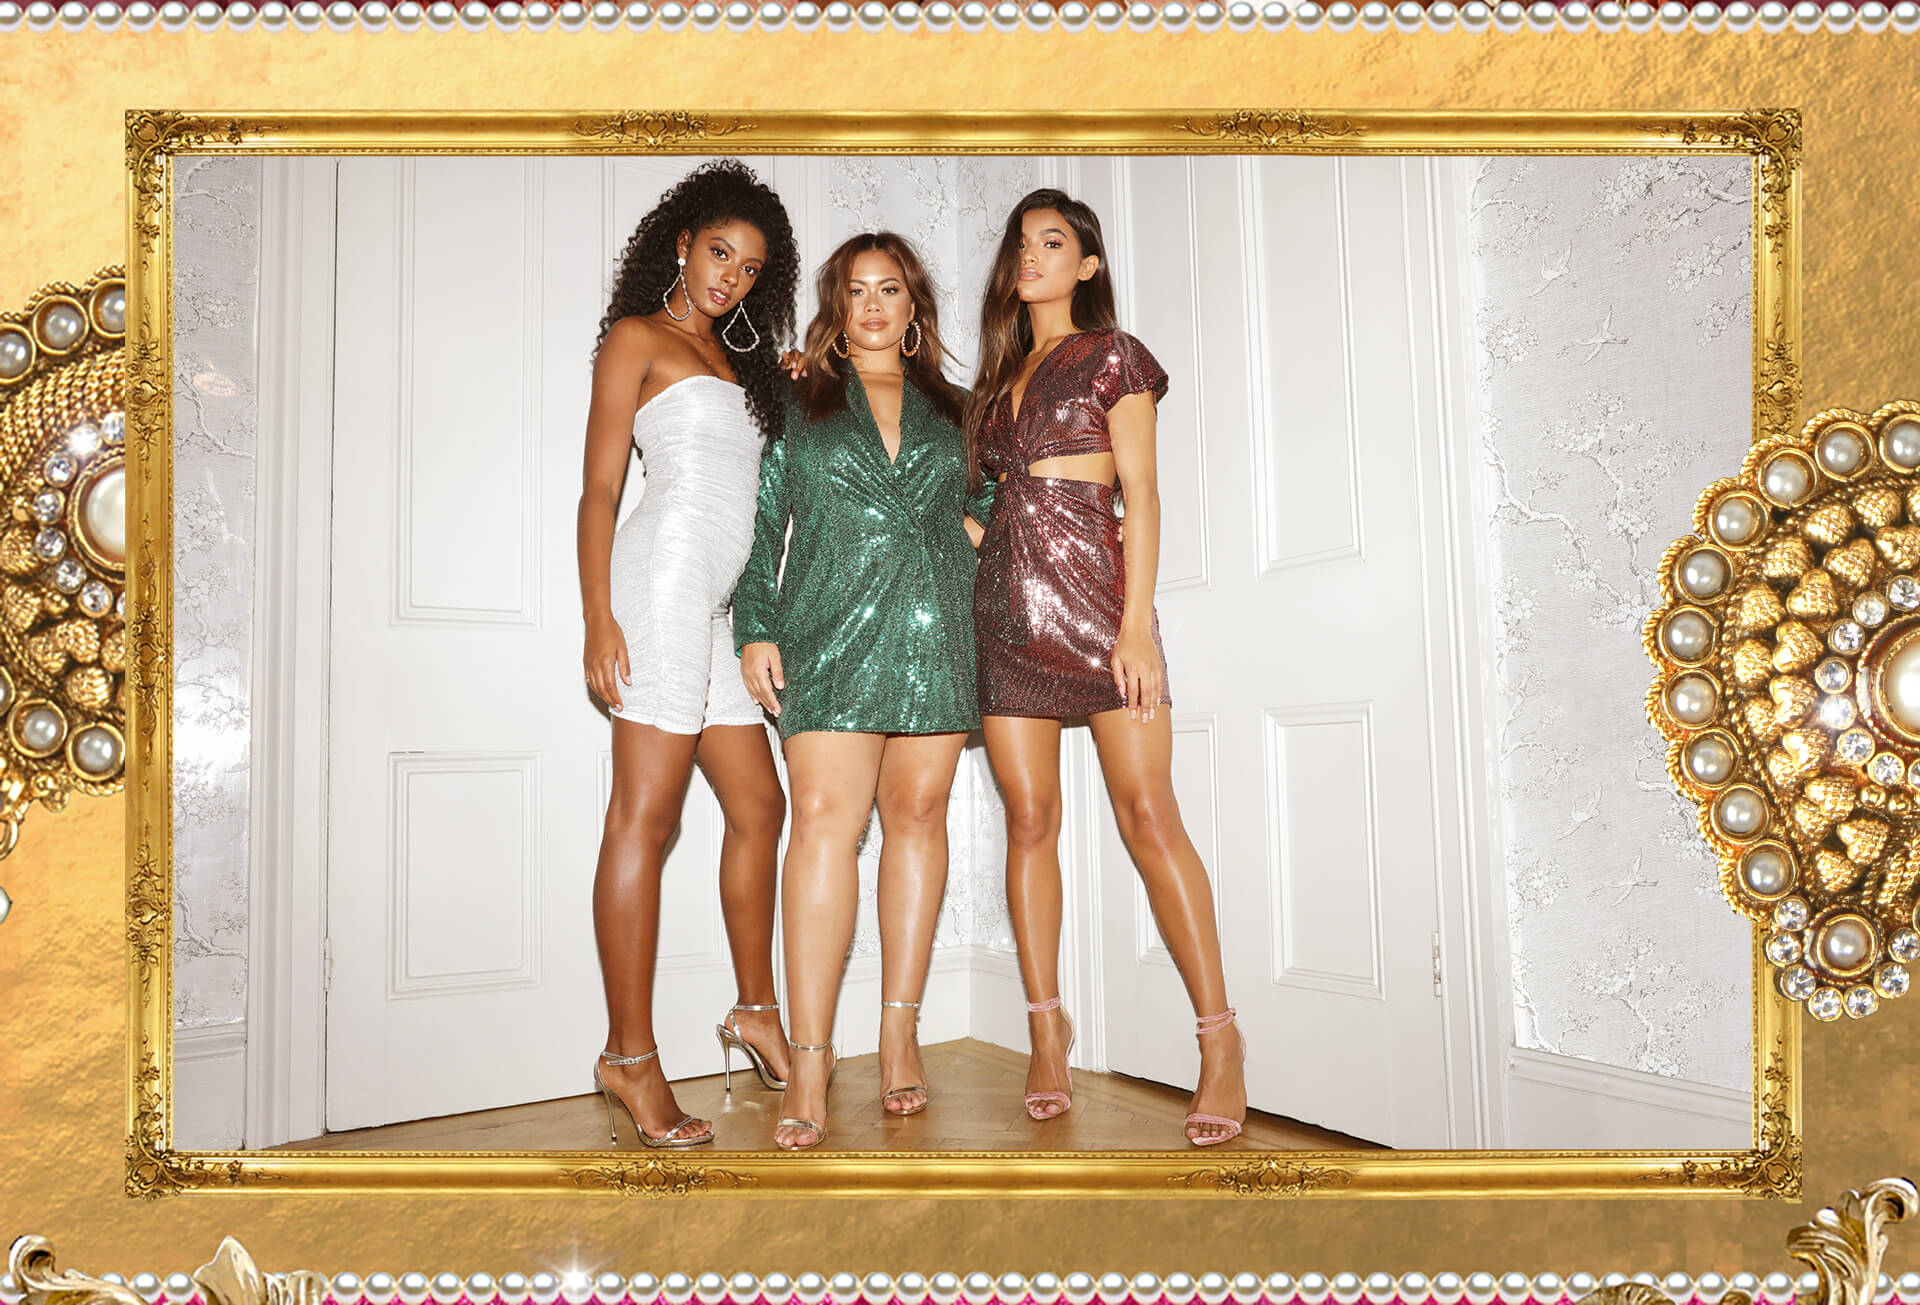 Christmas Lookbook White Glittery Playsuit, Green Glitter Dress, Pink Glitter Dress Desktop